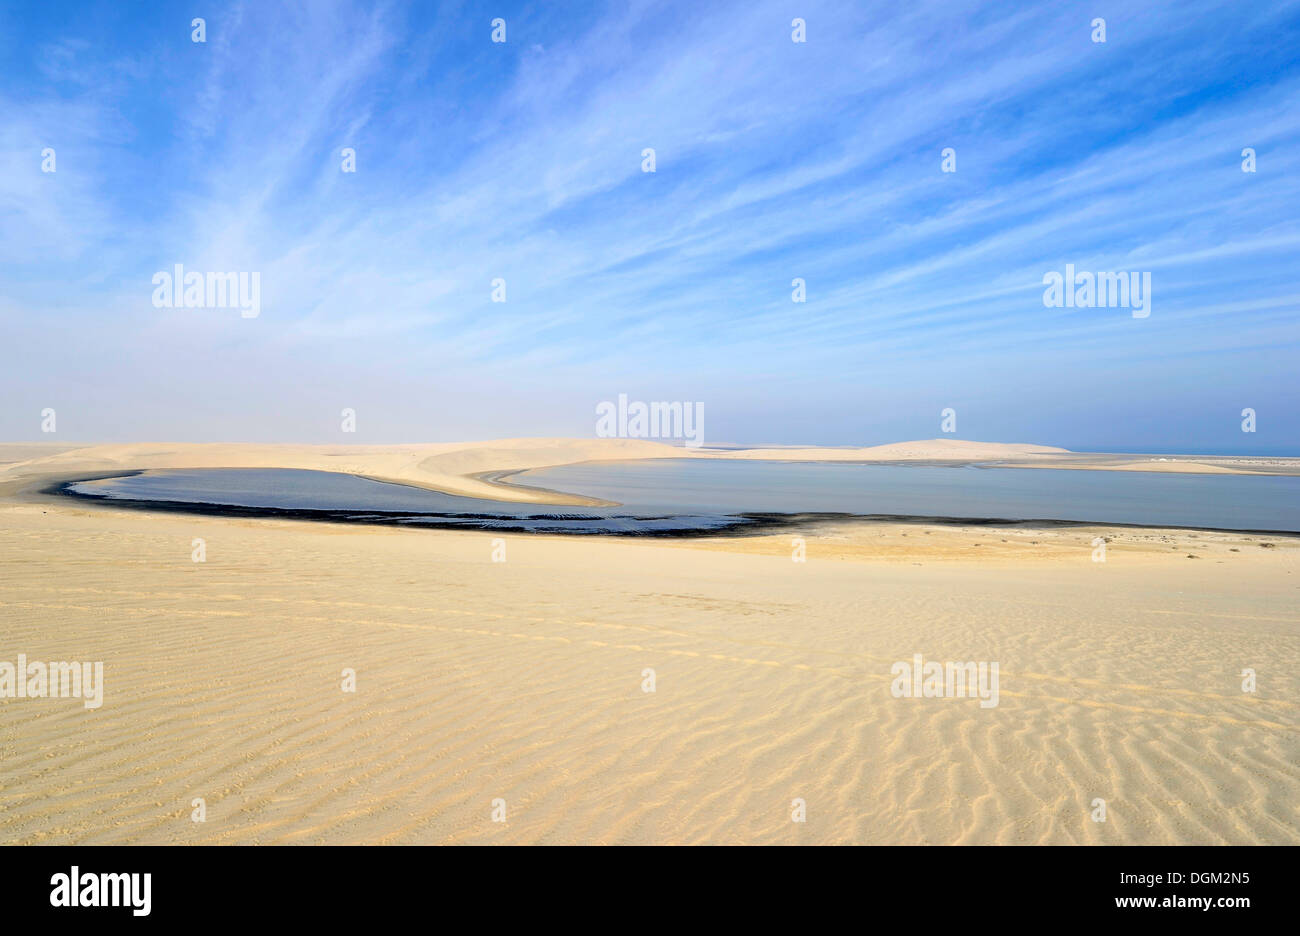 Khor Al Udeid Beach, Khor El Deid, Inland Sea, desert miracle of Qatar, Emirate of Qatar, Persian Gulf, Middle East, Asia - Stock Image